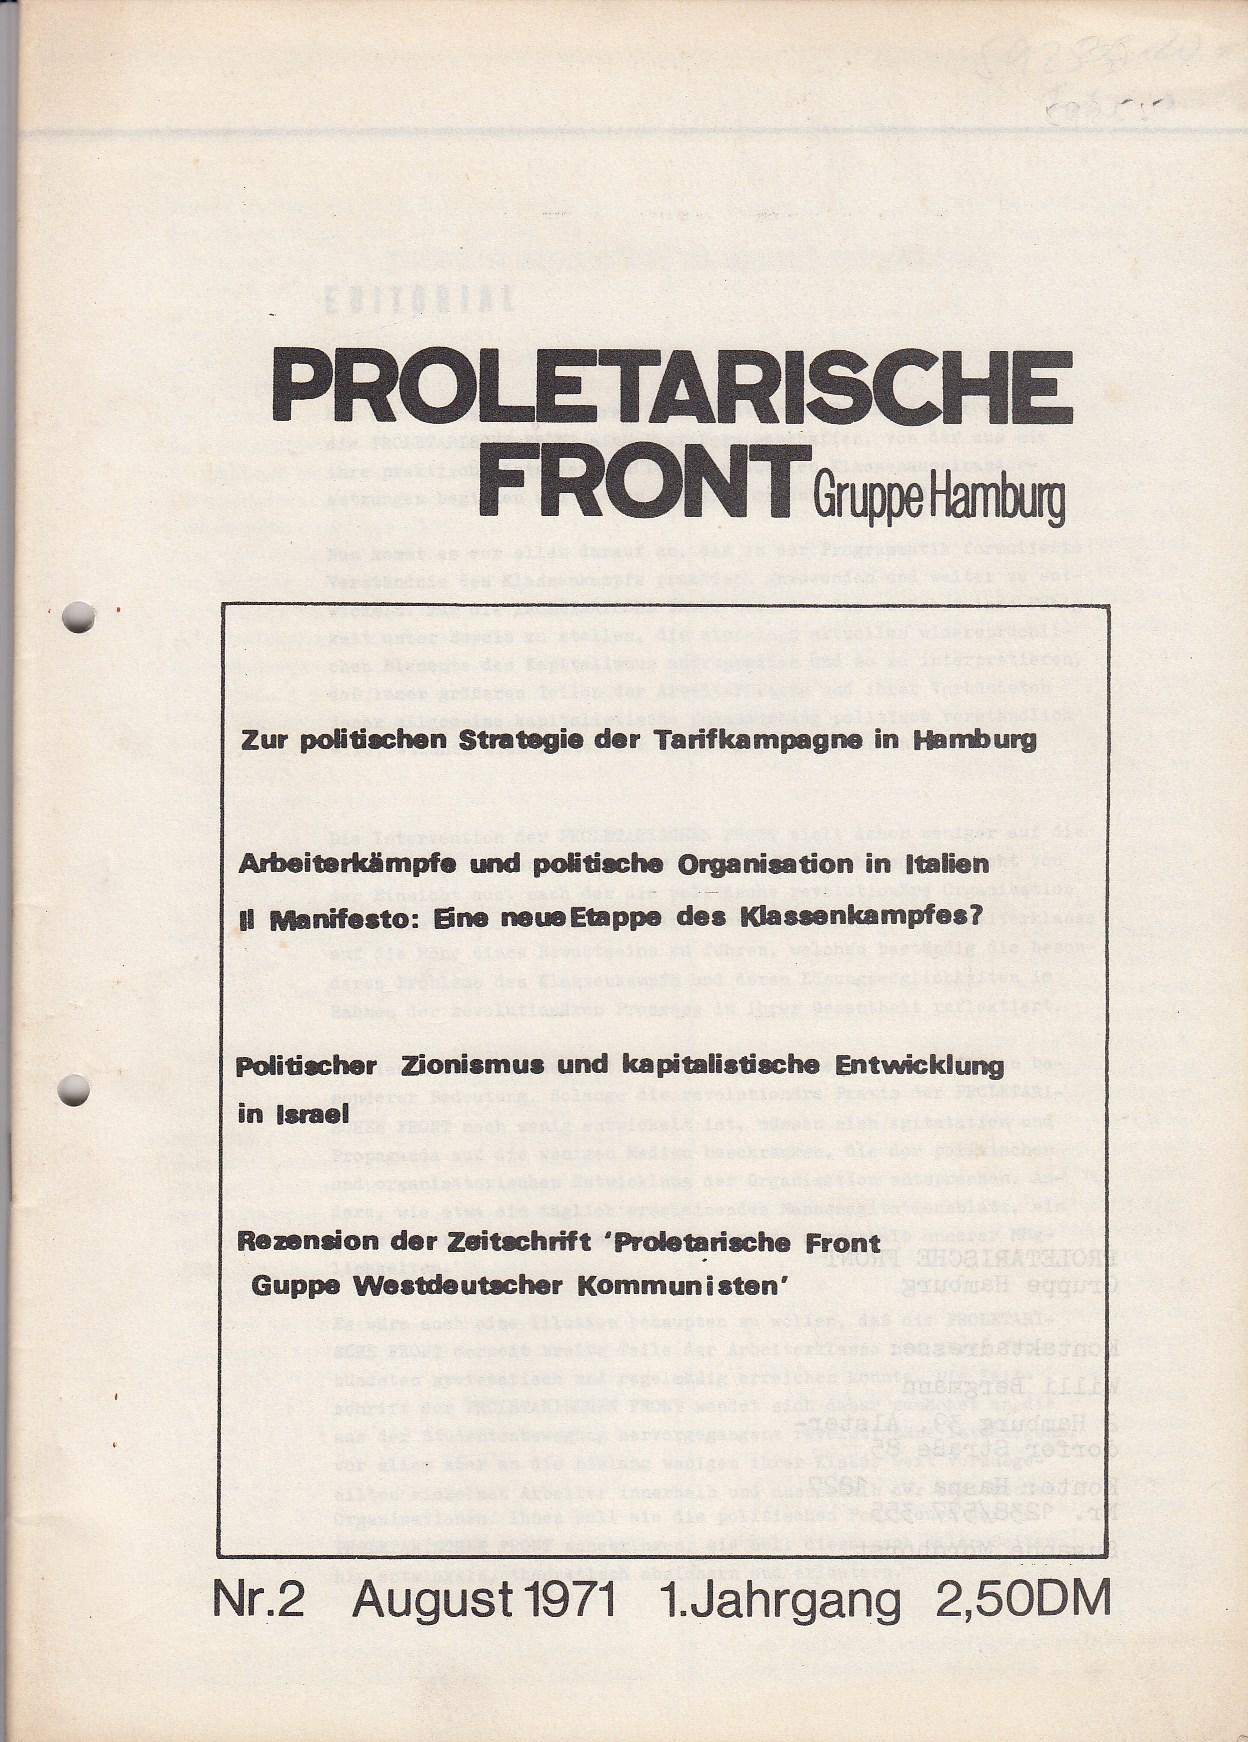 Proletarische Front. Gruppe Hamburg. Nr.2, August 1971. Kontaktadresse Willi Bergmann, Susanne Mordhorst